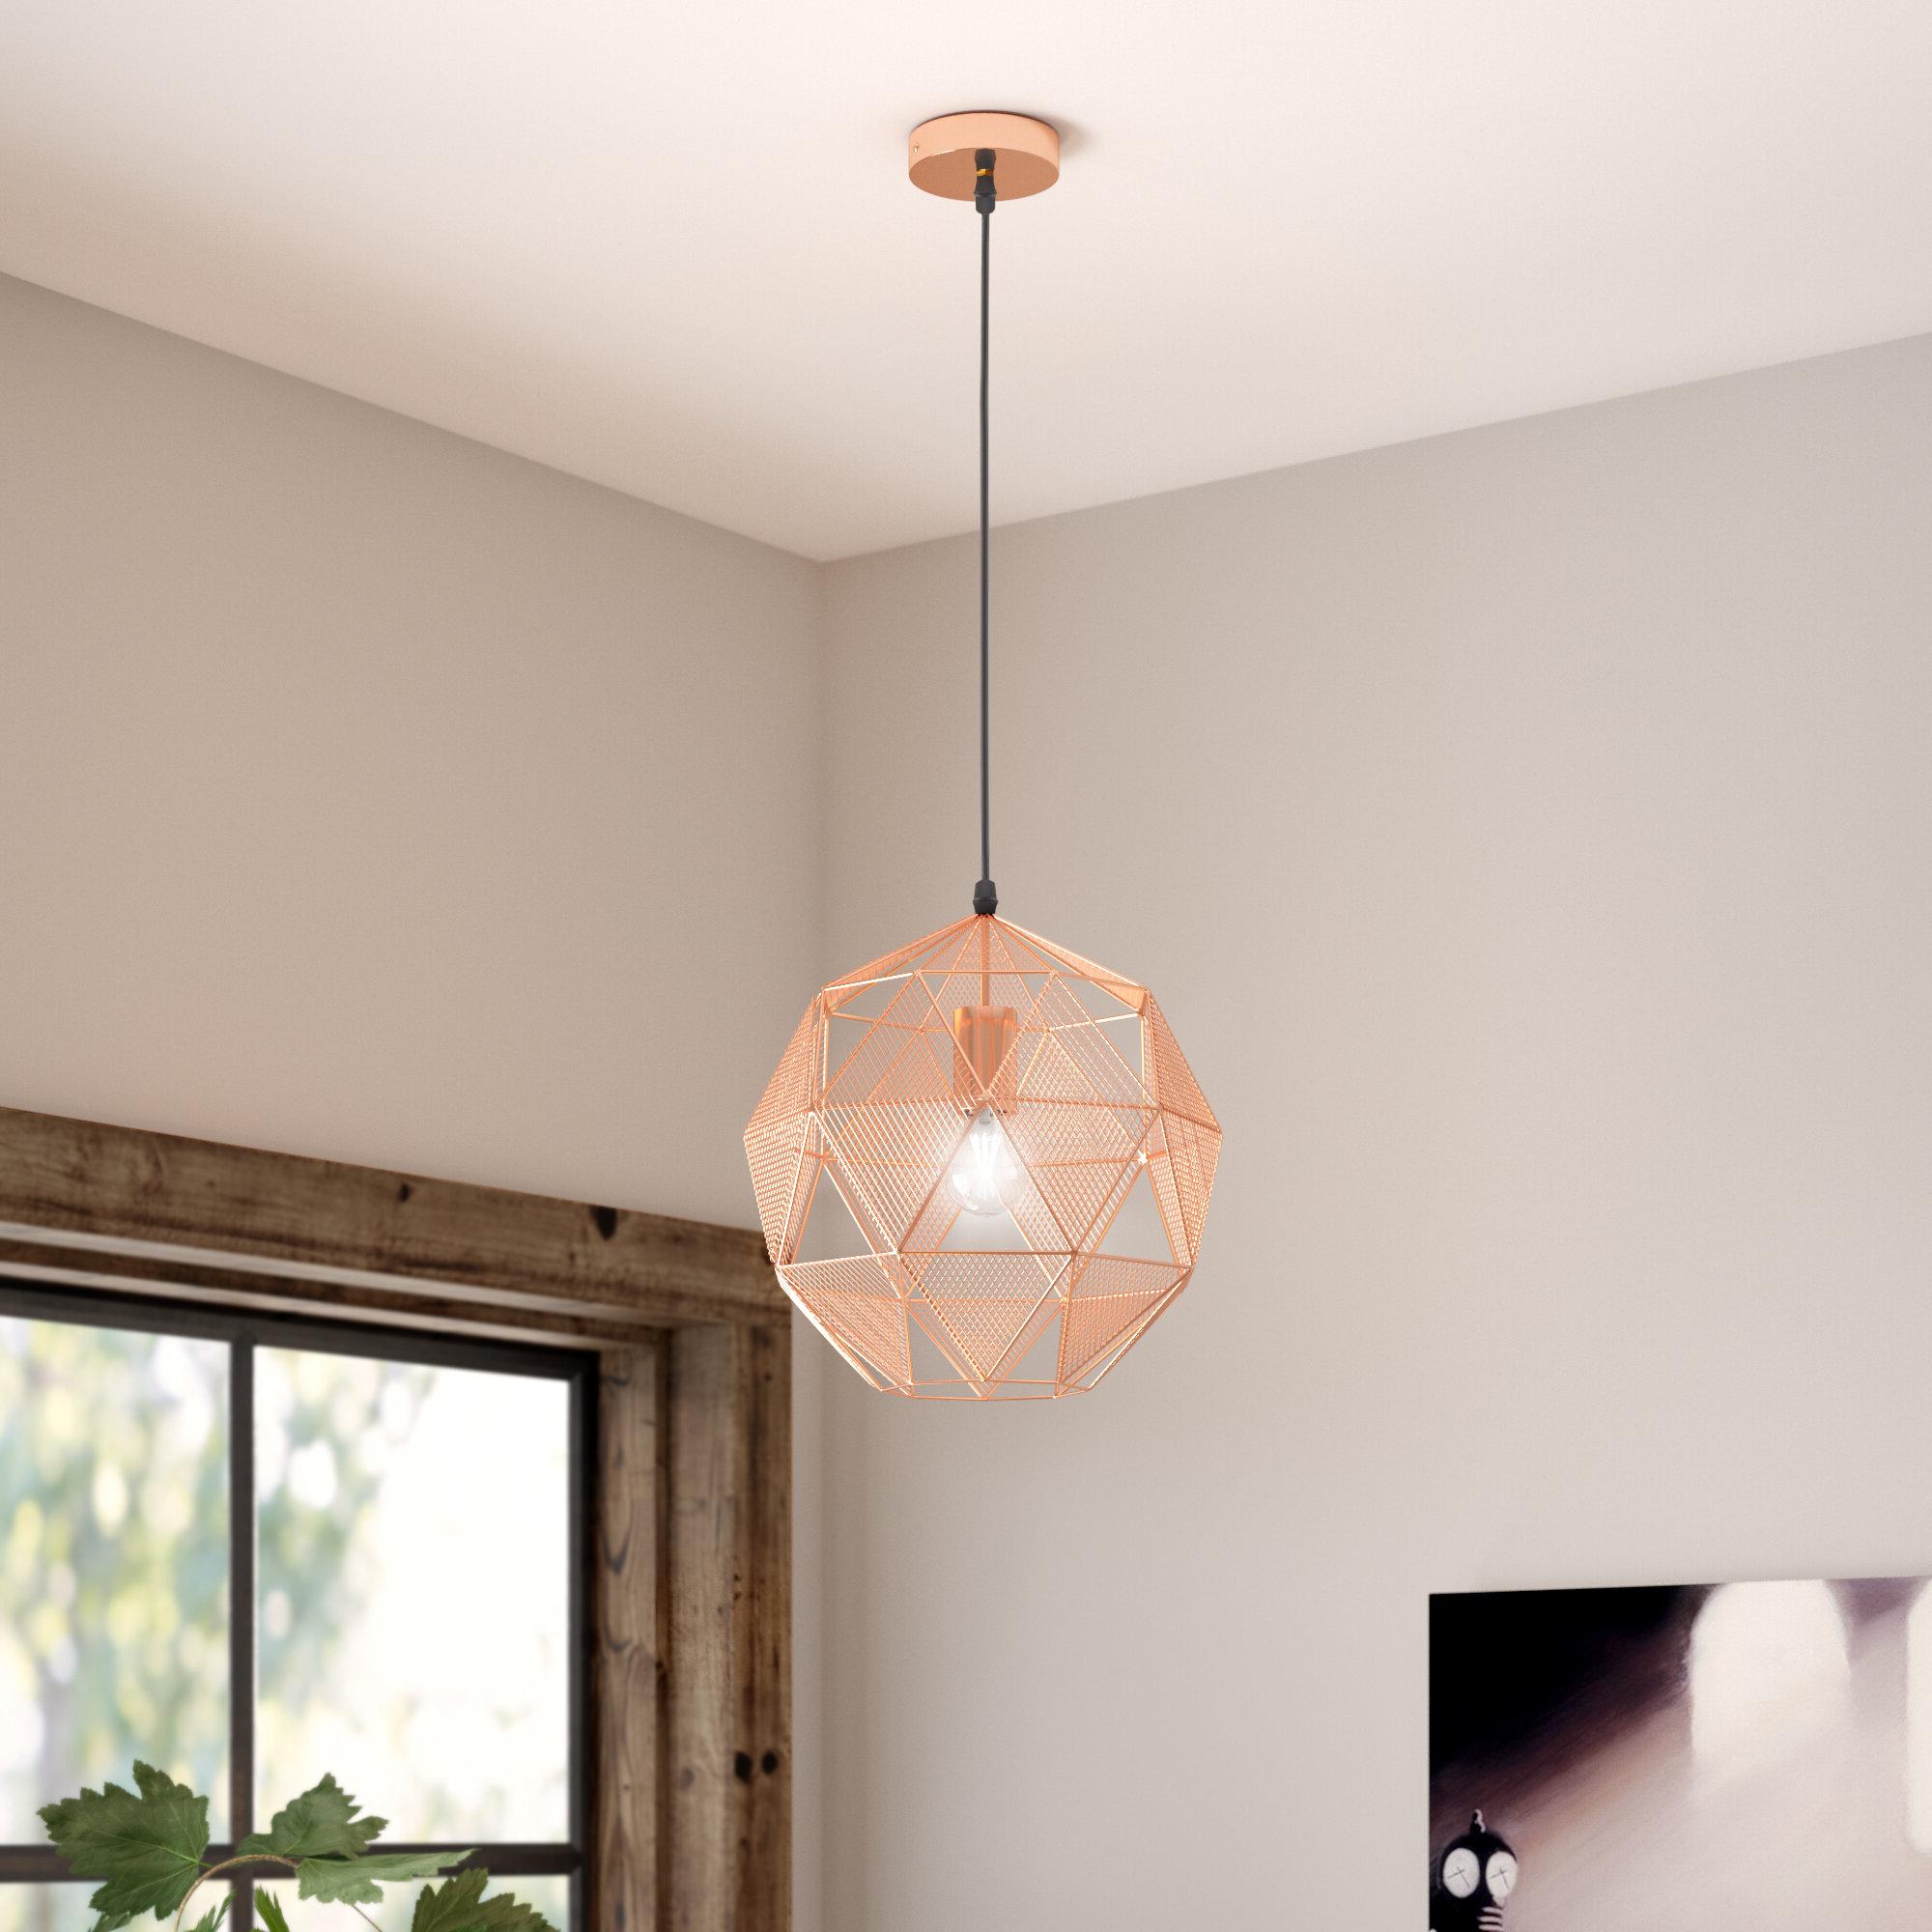 Immanuel 1 Light Geometric Pendant With Regard To Recent 1 Light Geometric Globe Pendants (View 6 of 25)